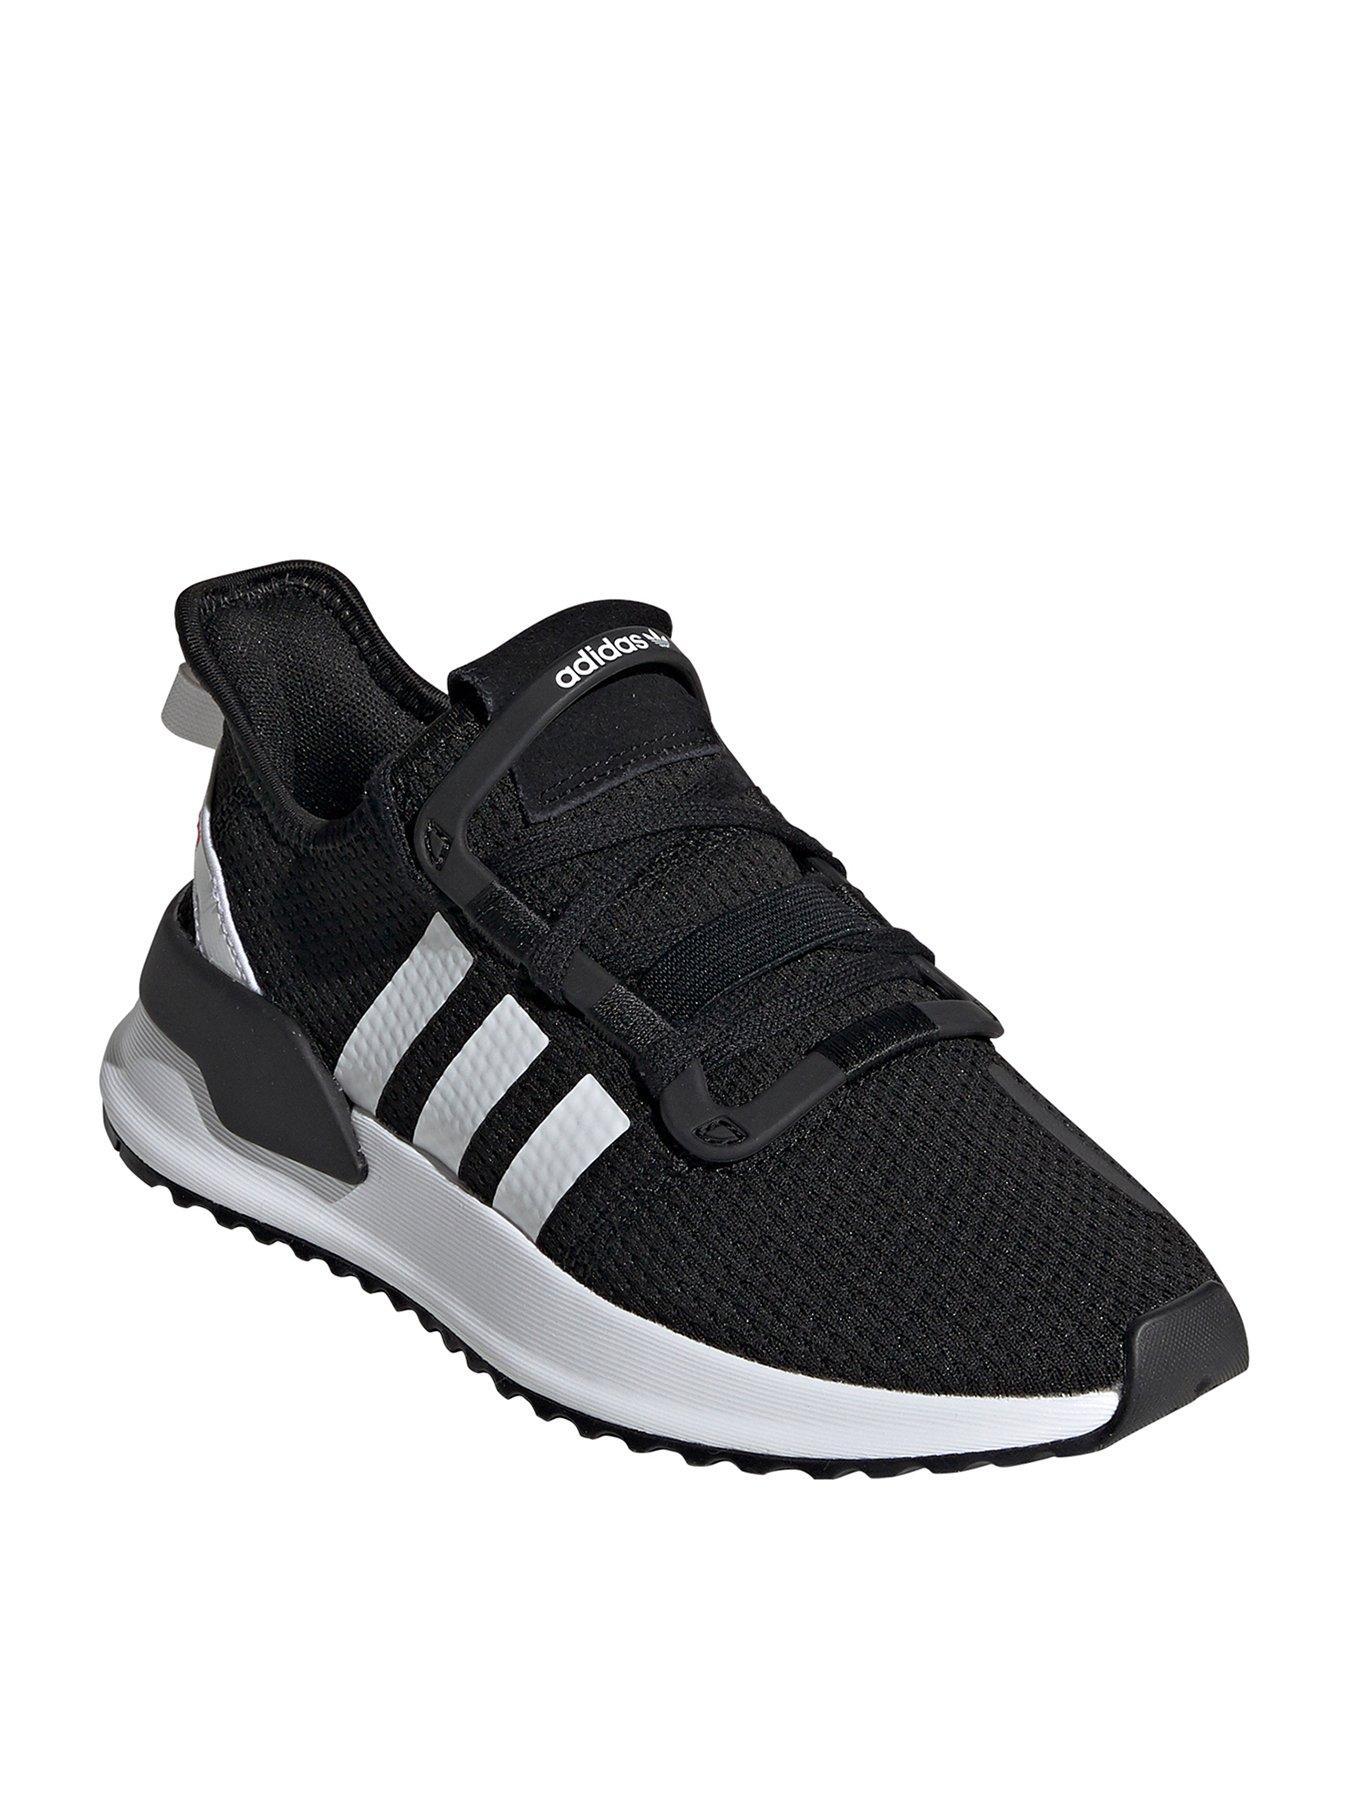 adidas Originals U_Path Junior Trainers BlackWhite | very